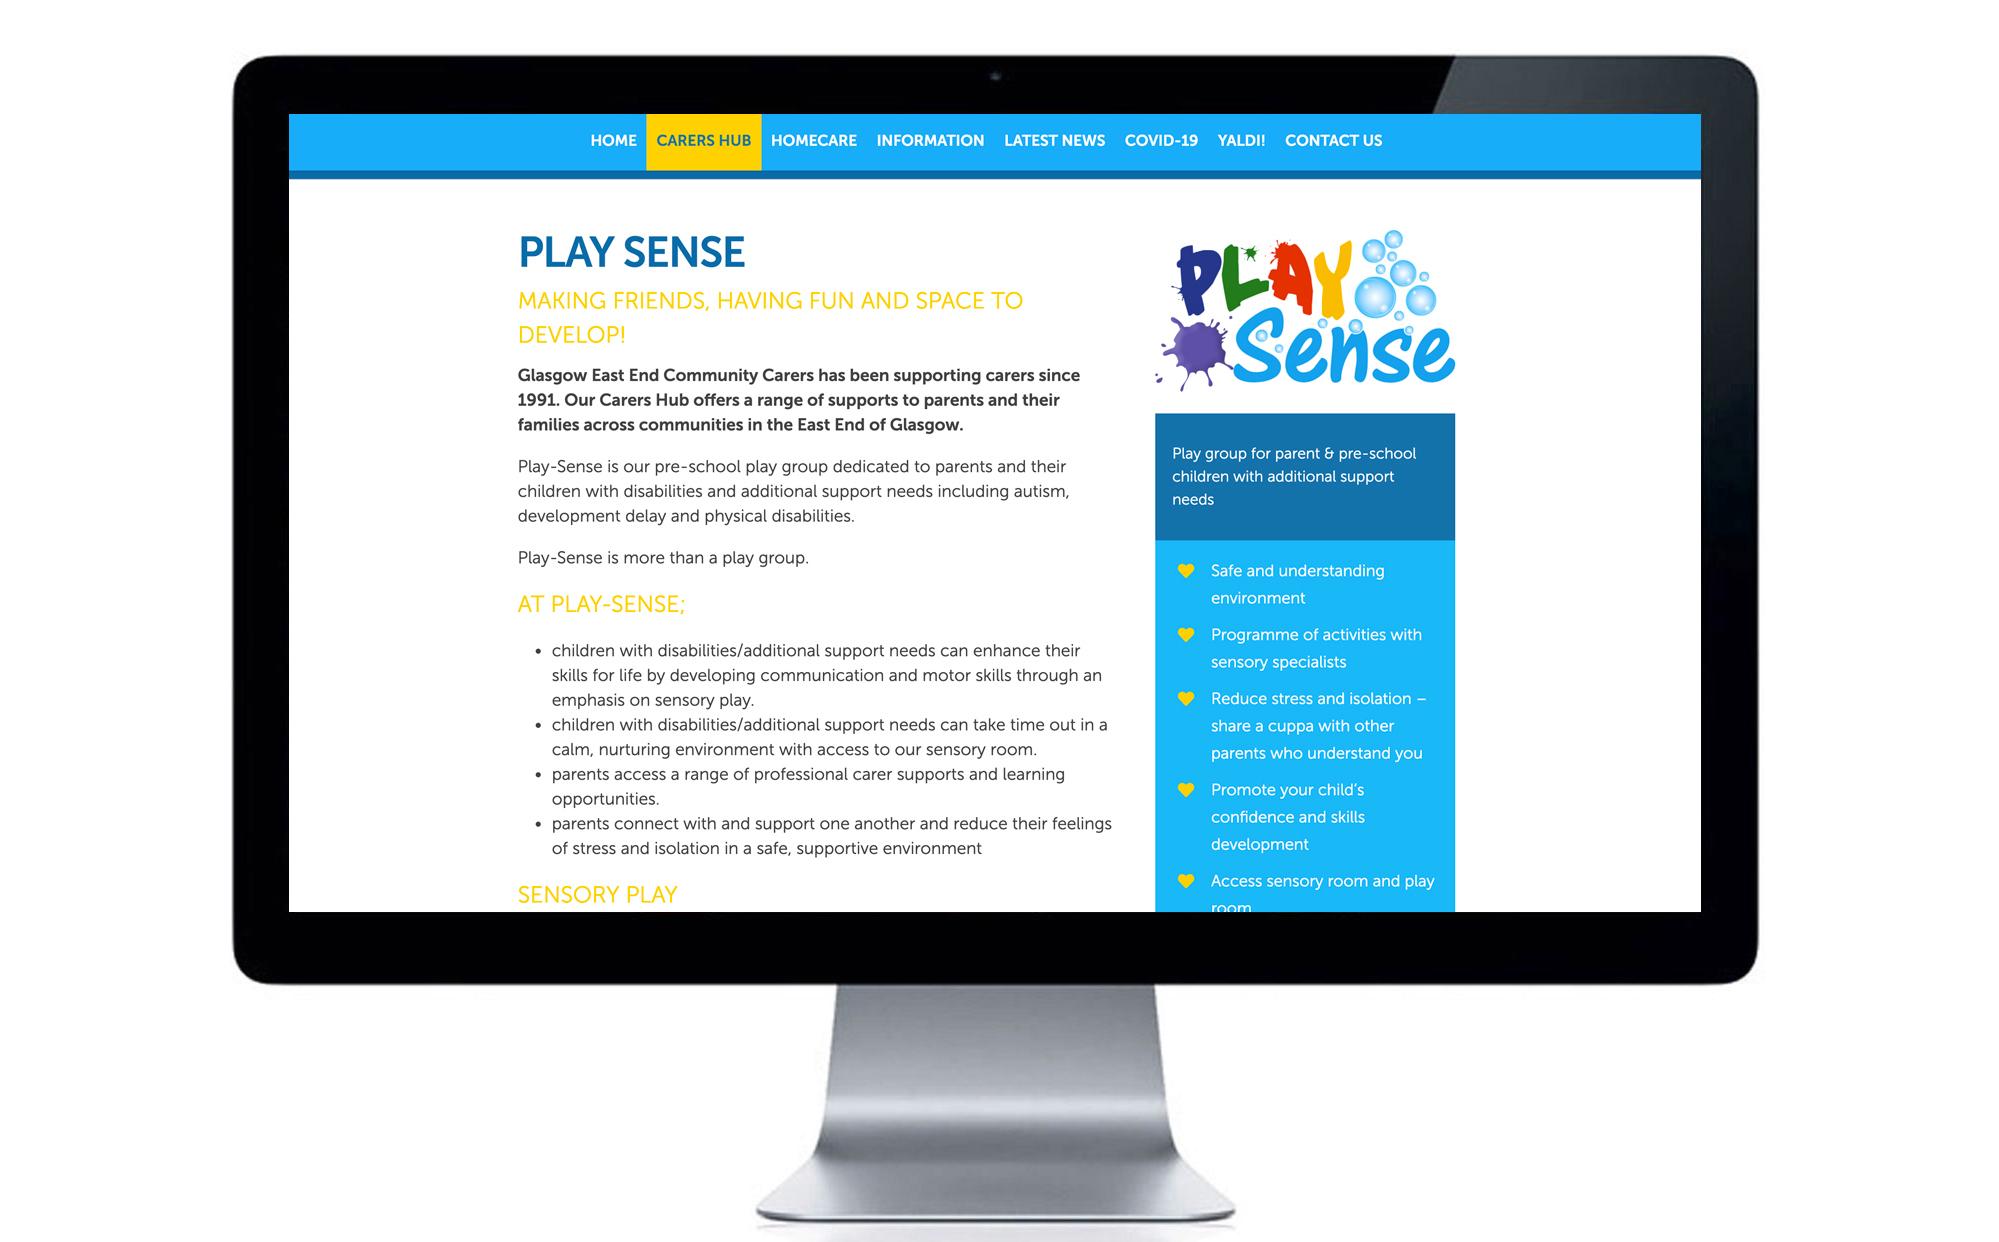 GEECC Website Image 2